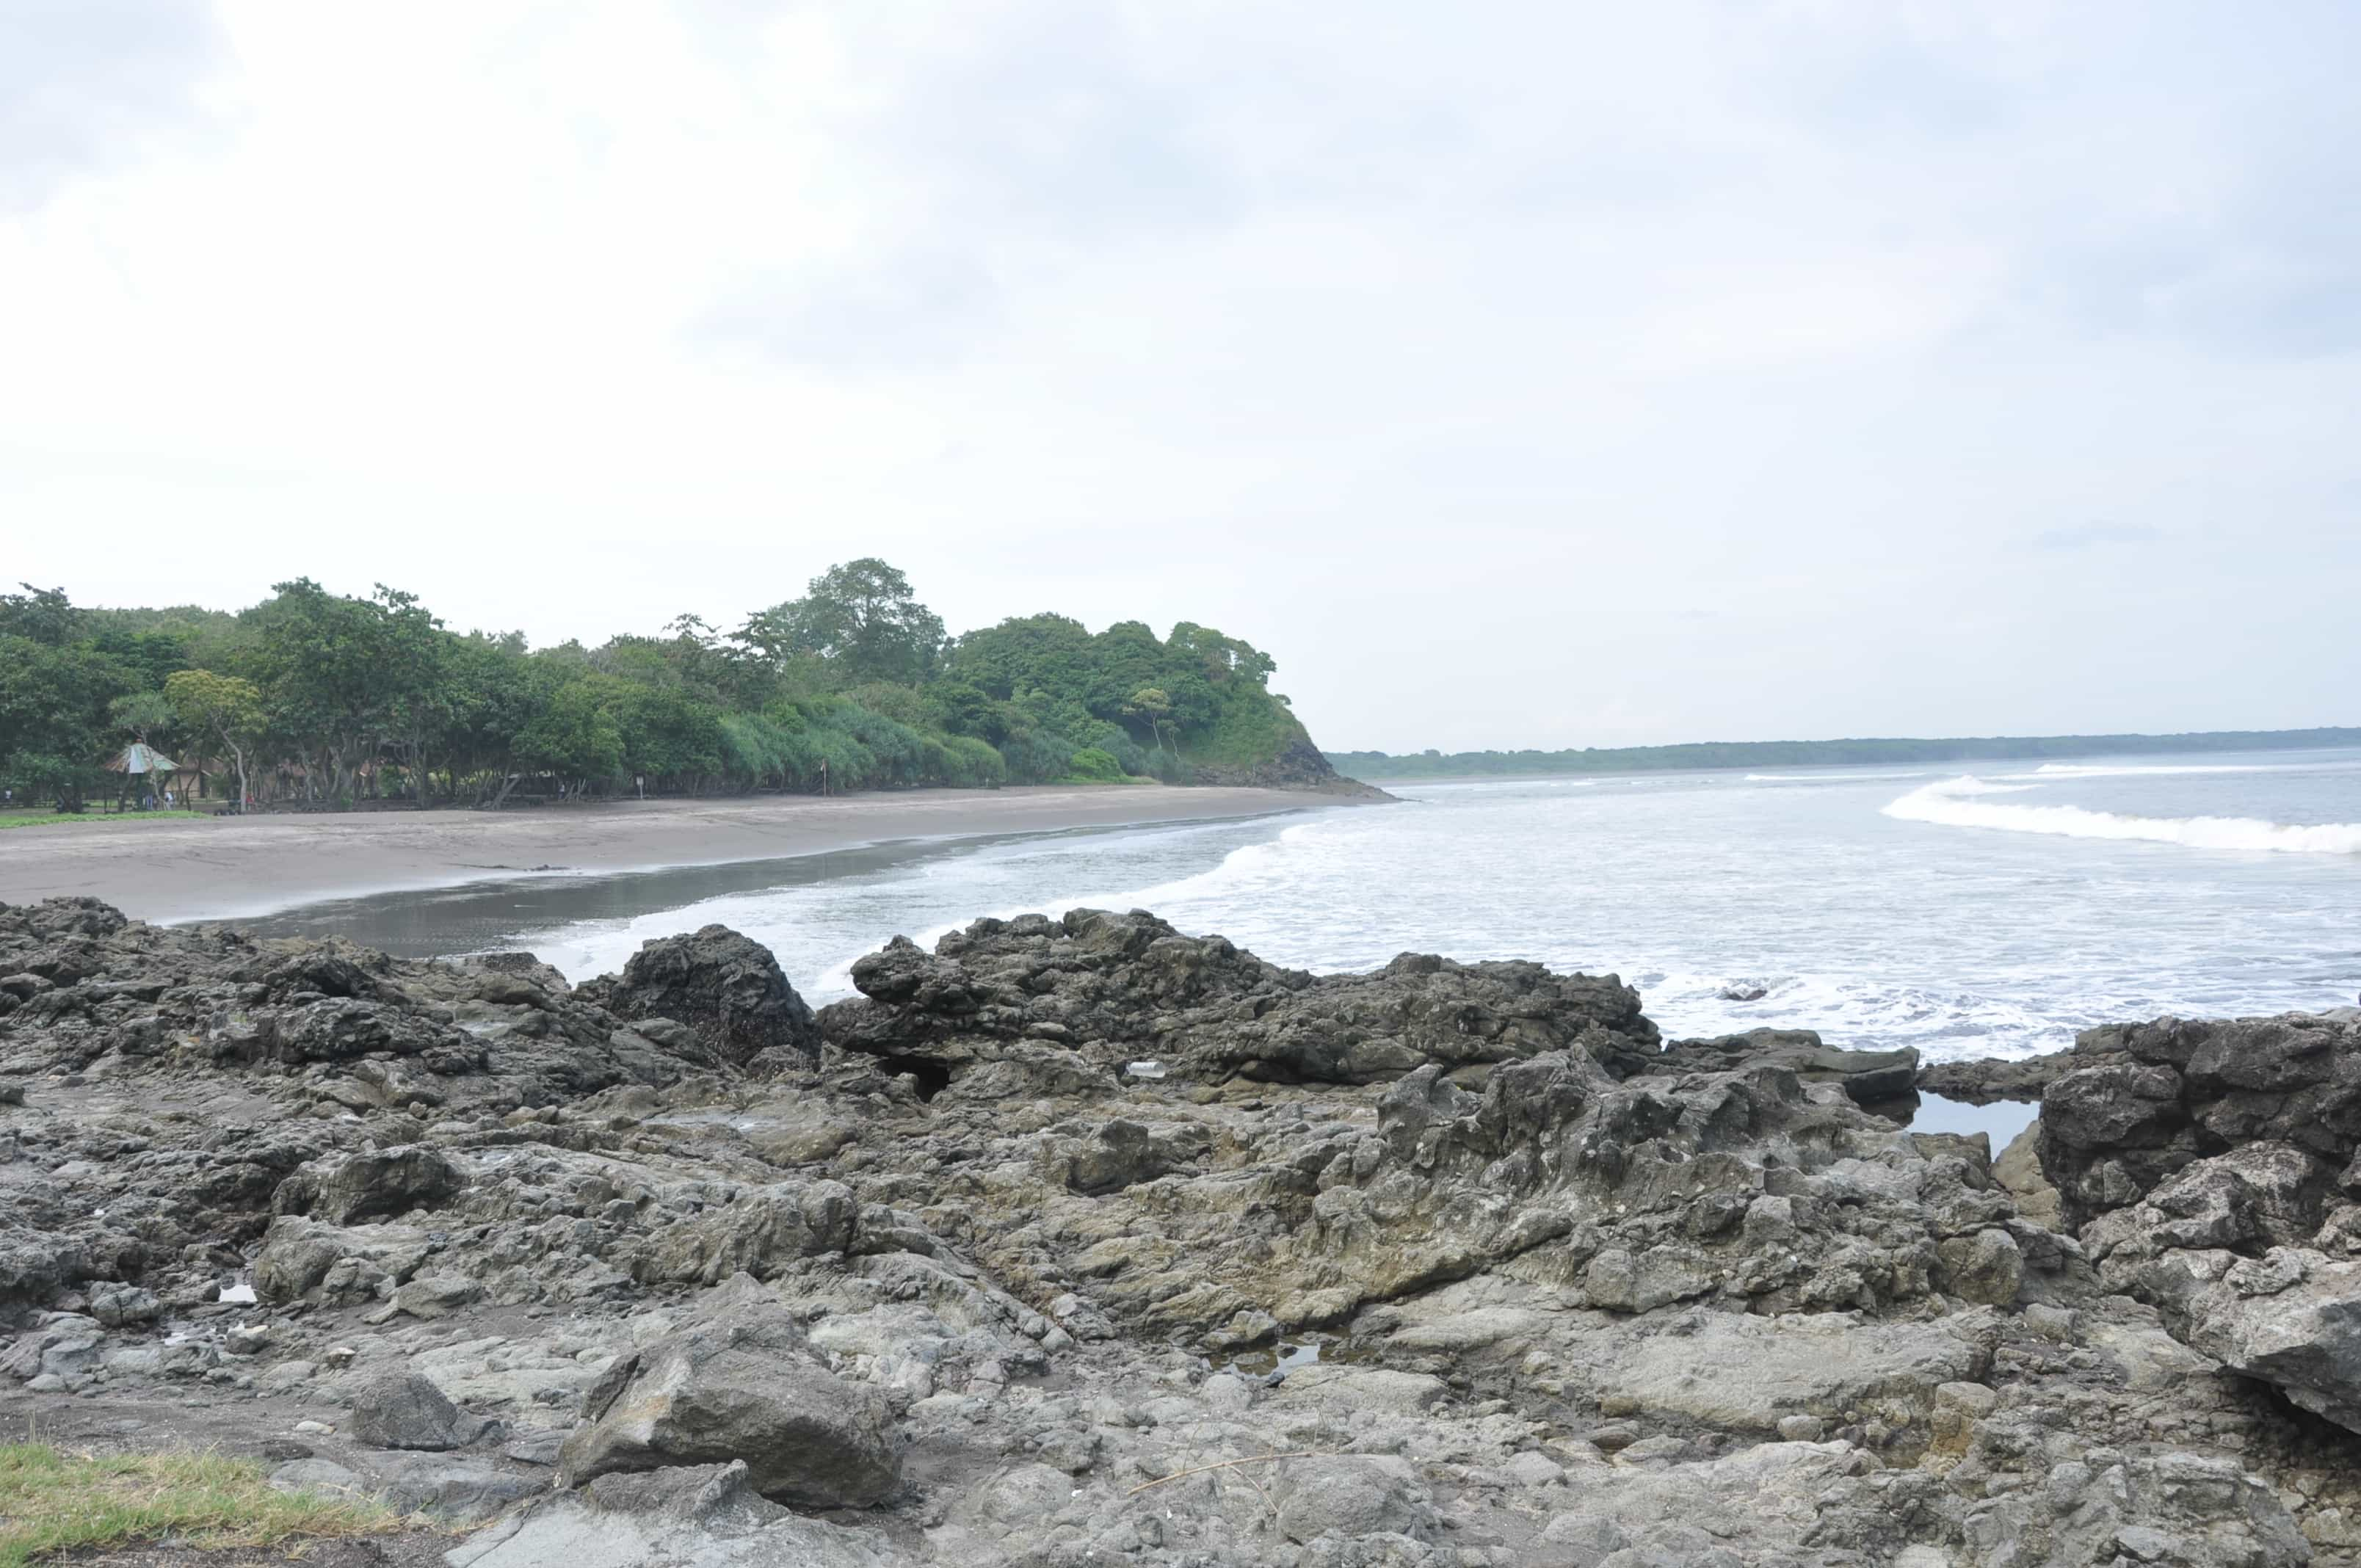 Pantai Grajagan Banyuwangi Menjajikan Keindahan Alam Ulinulin Jawa Timur Kab